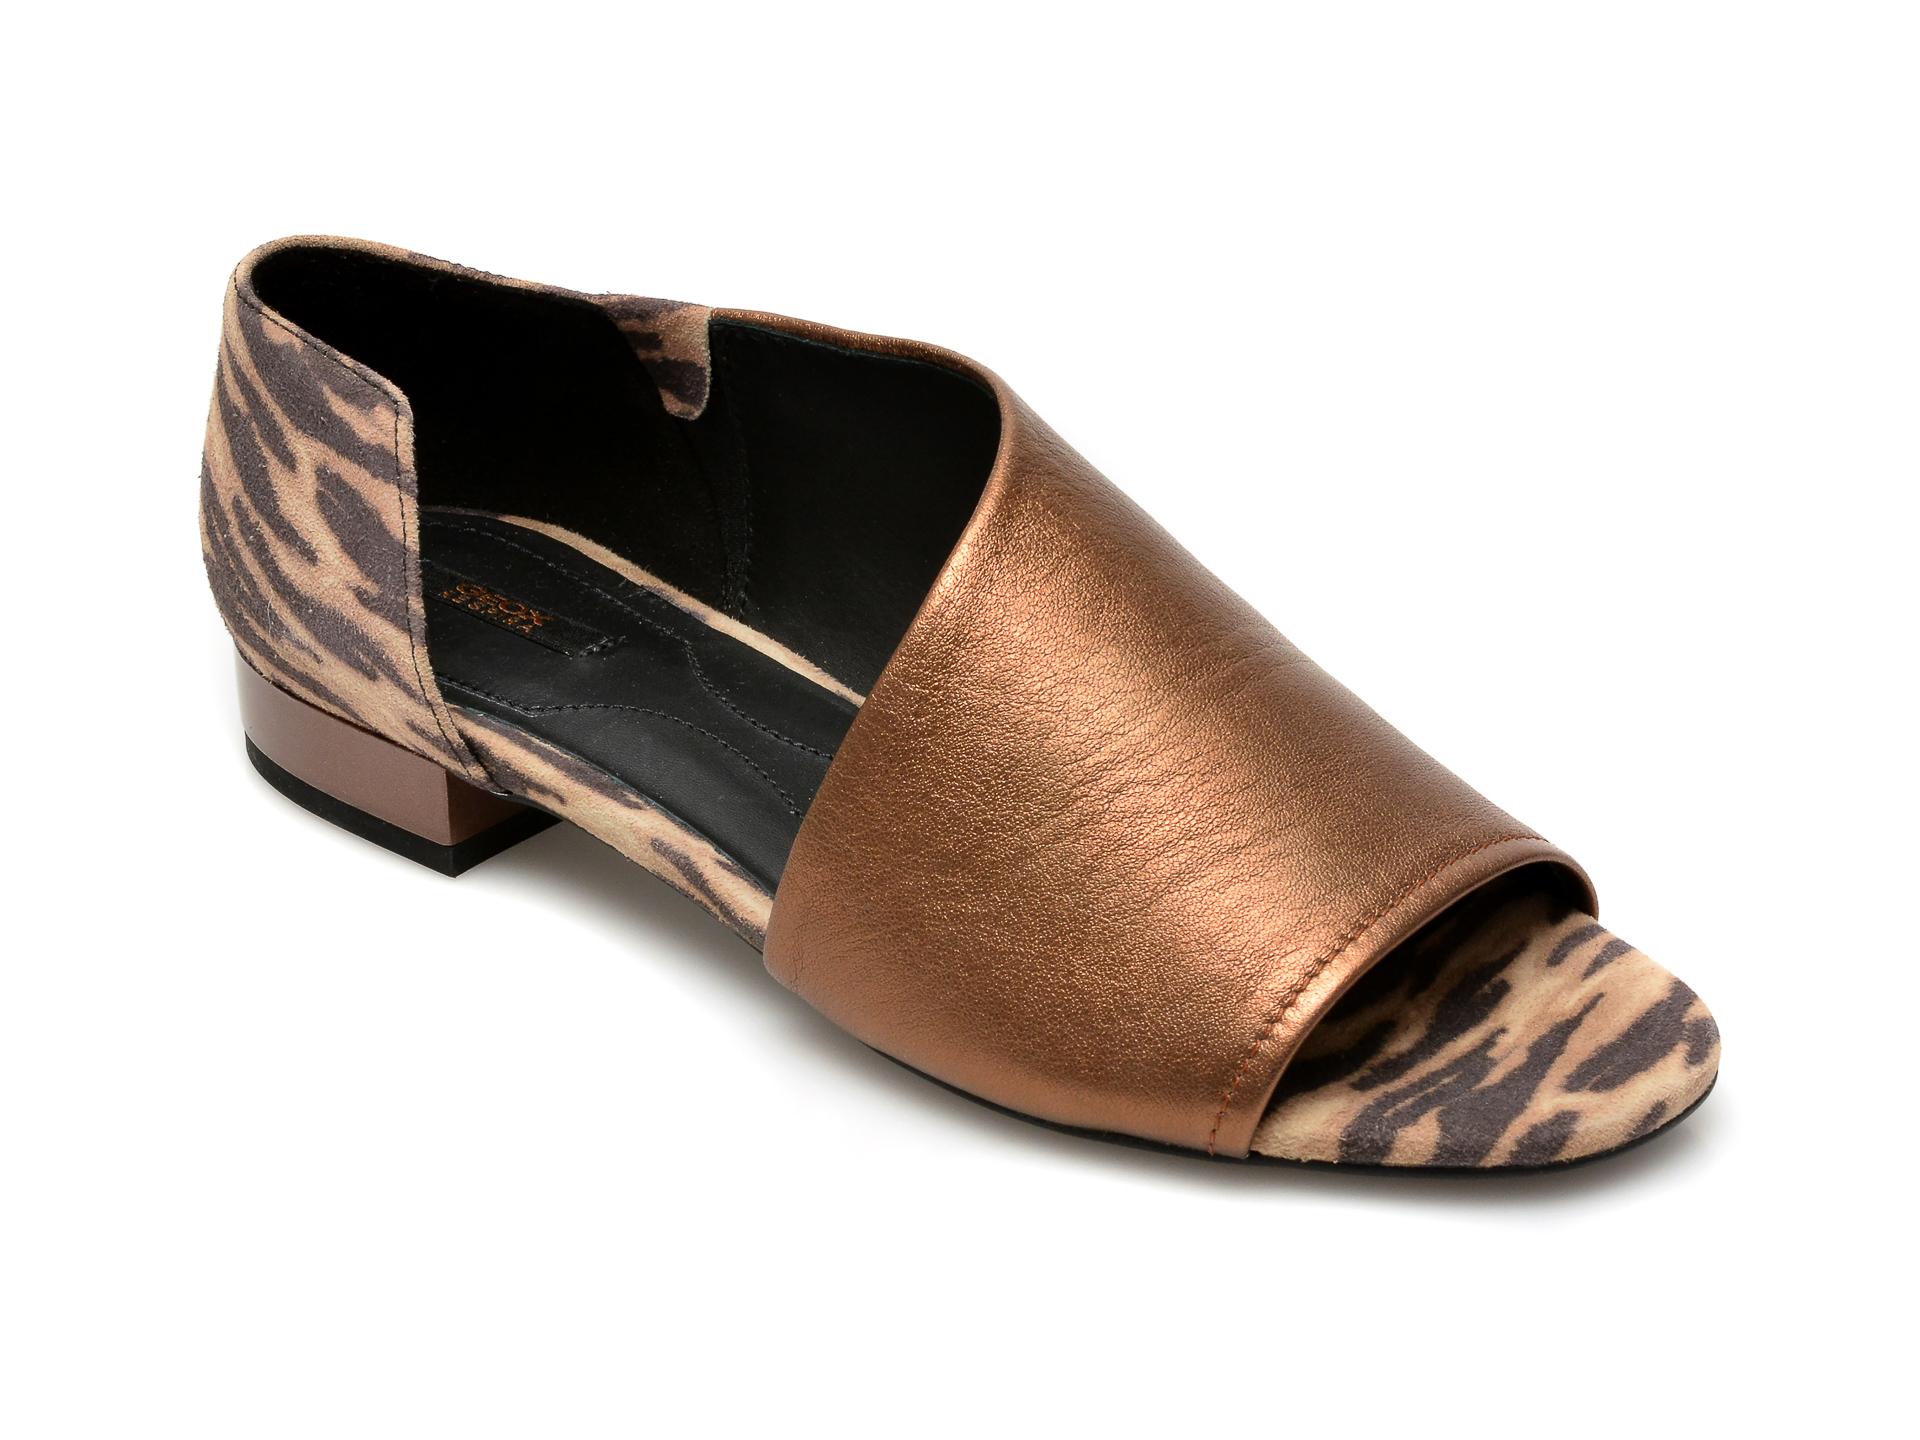 Sandale GEOX maro, D724HA, din piele naturala